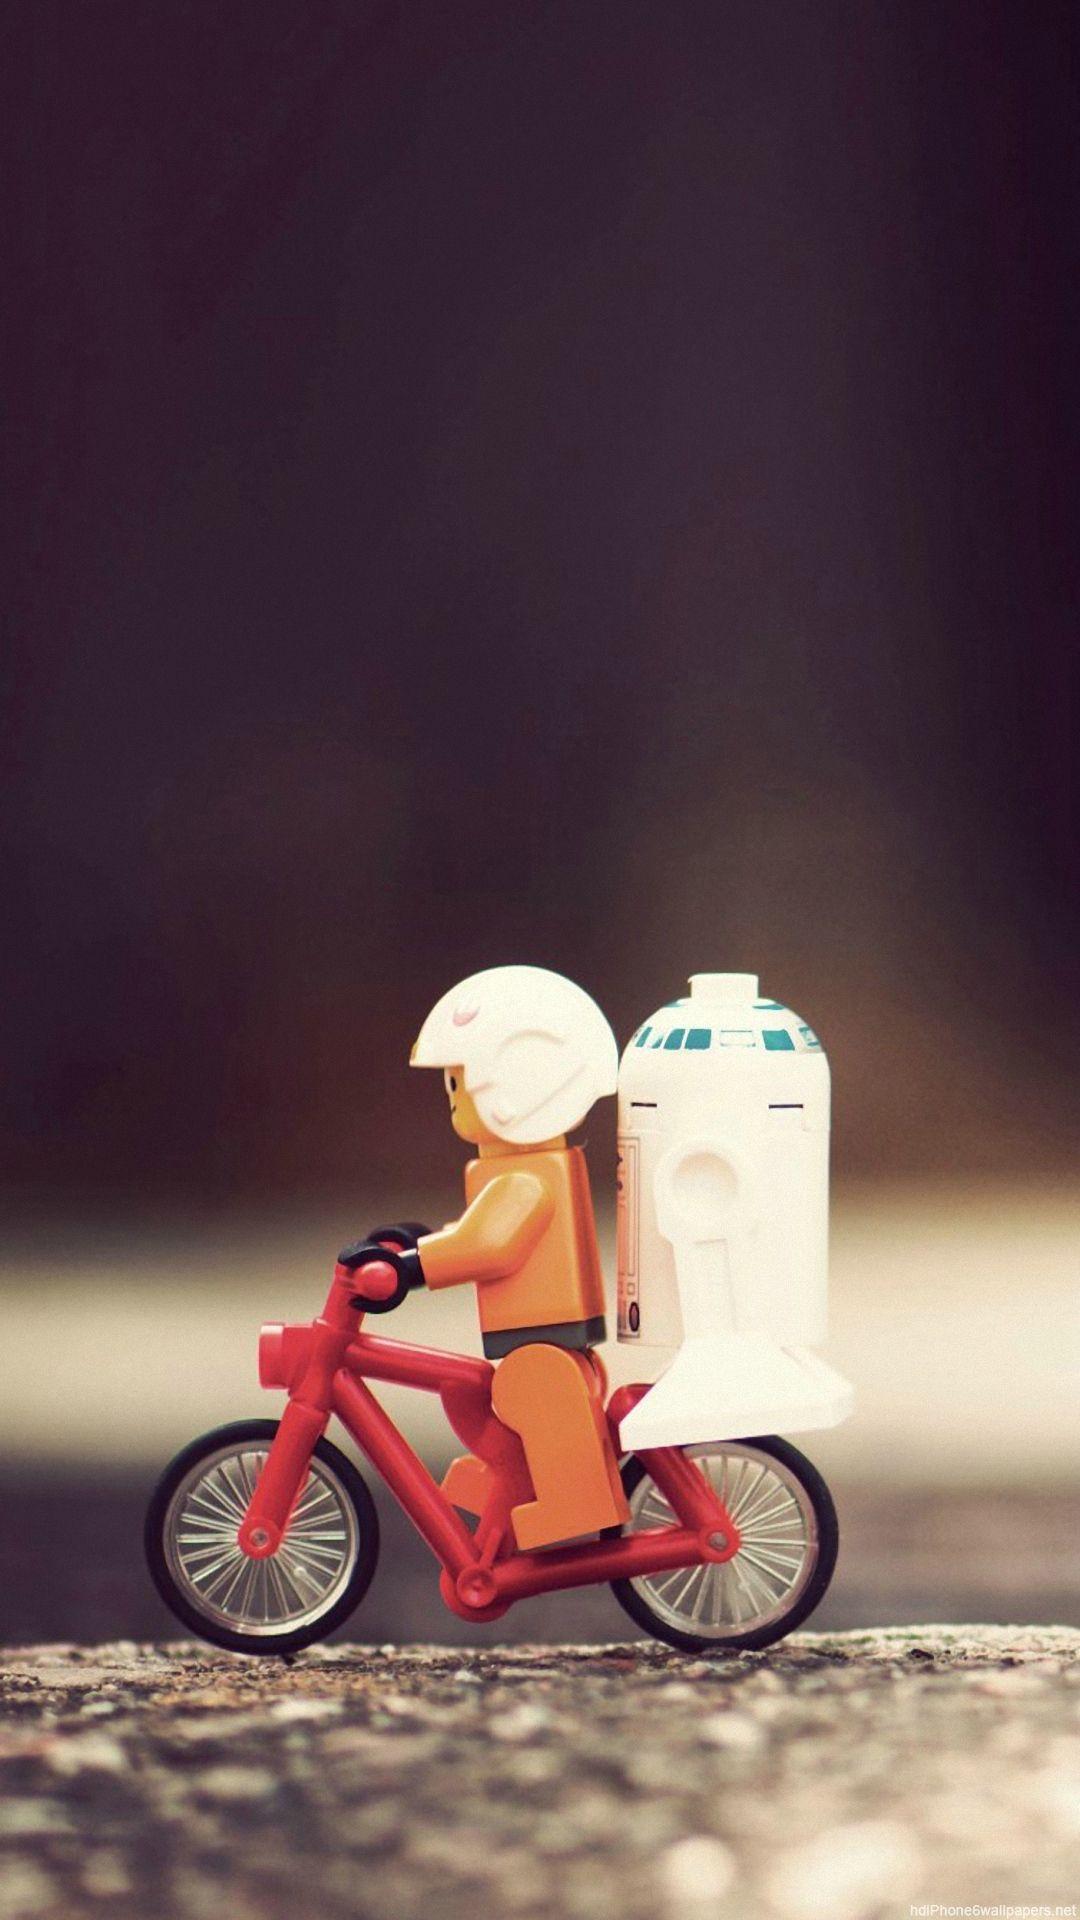 Cartoon Star Wars Iphone Background 1080x1920 Wallpaper Teahub Io